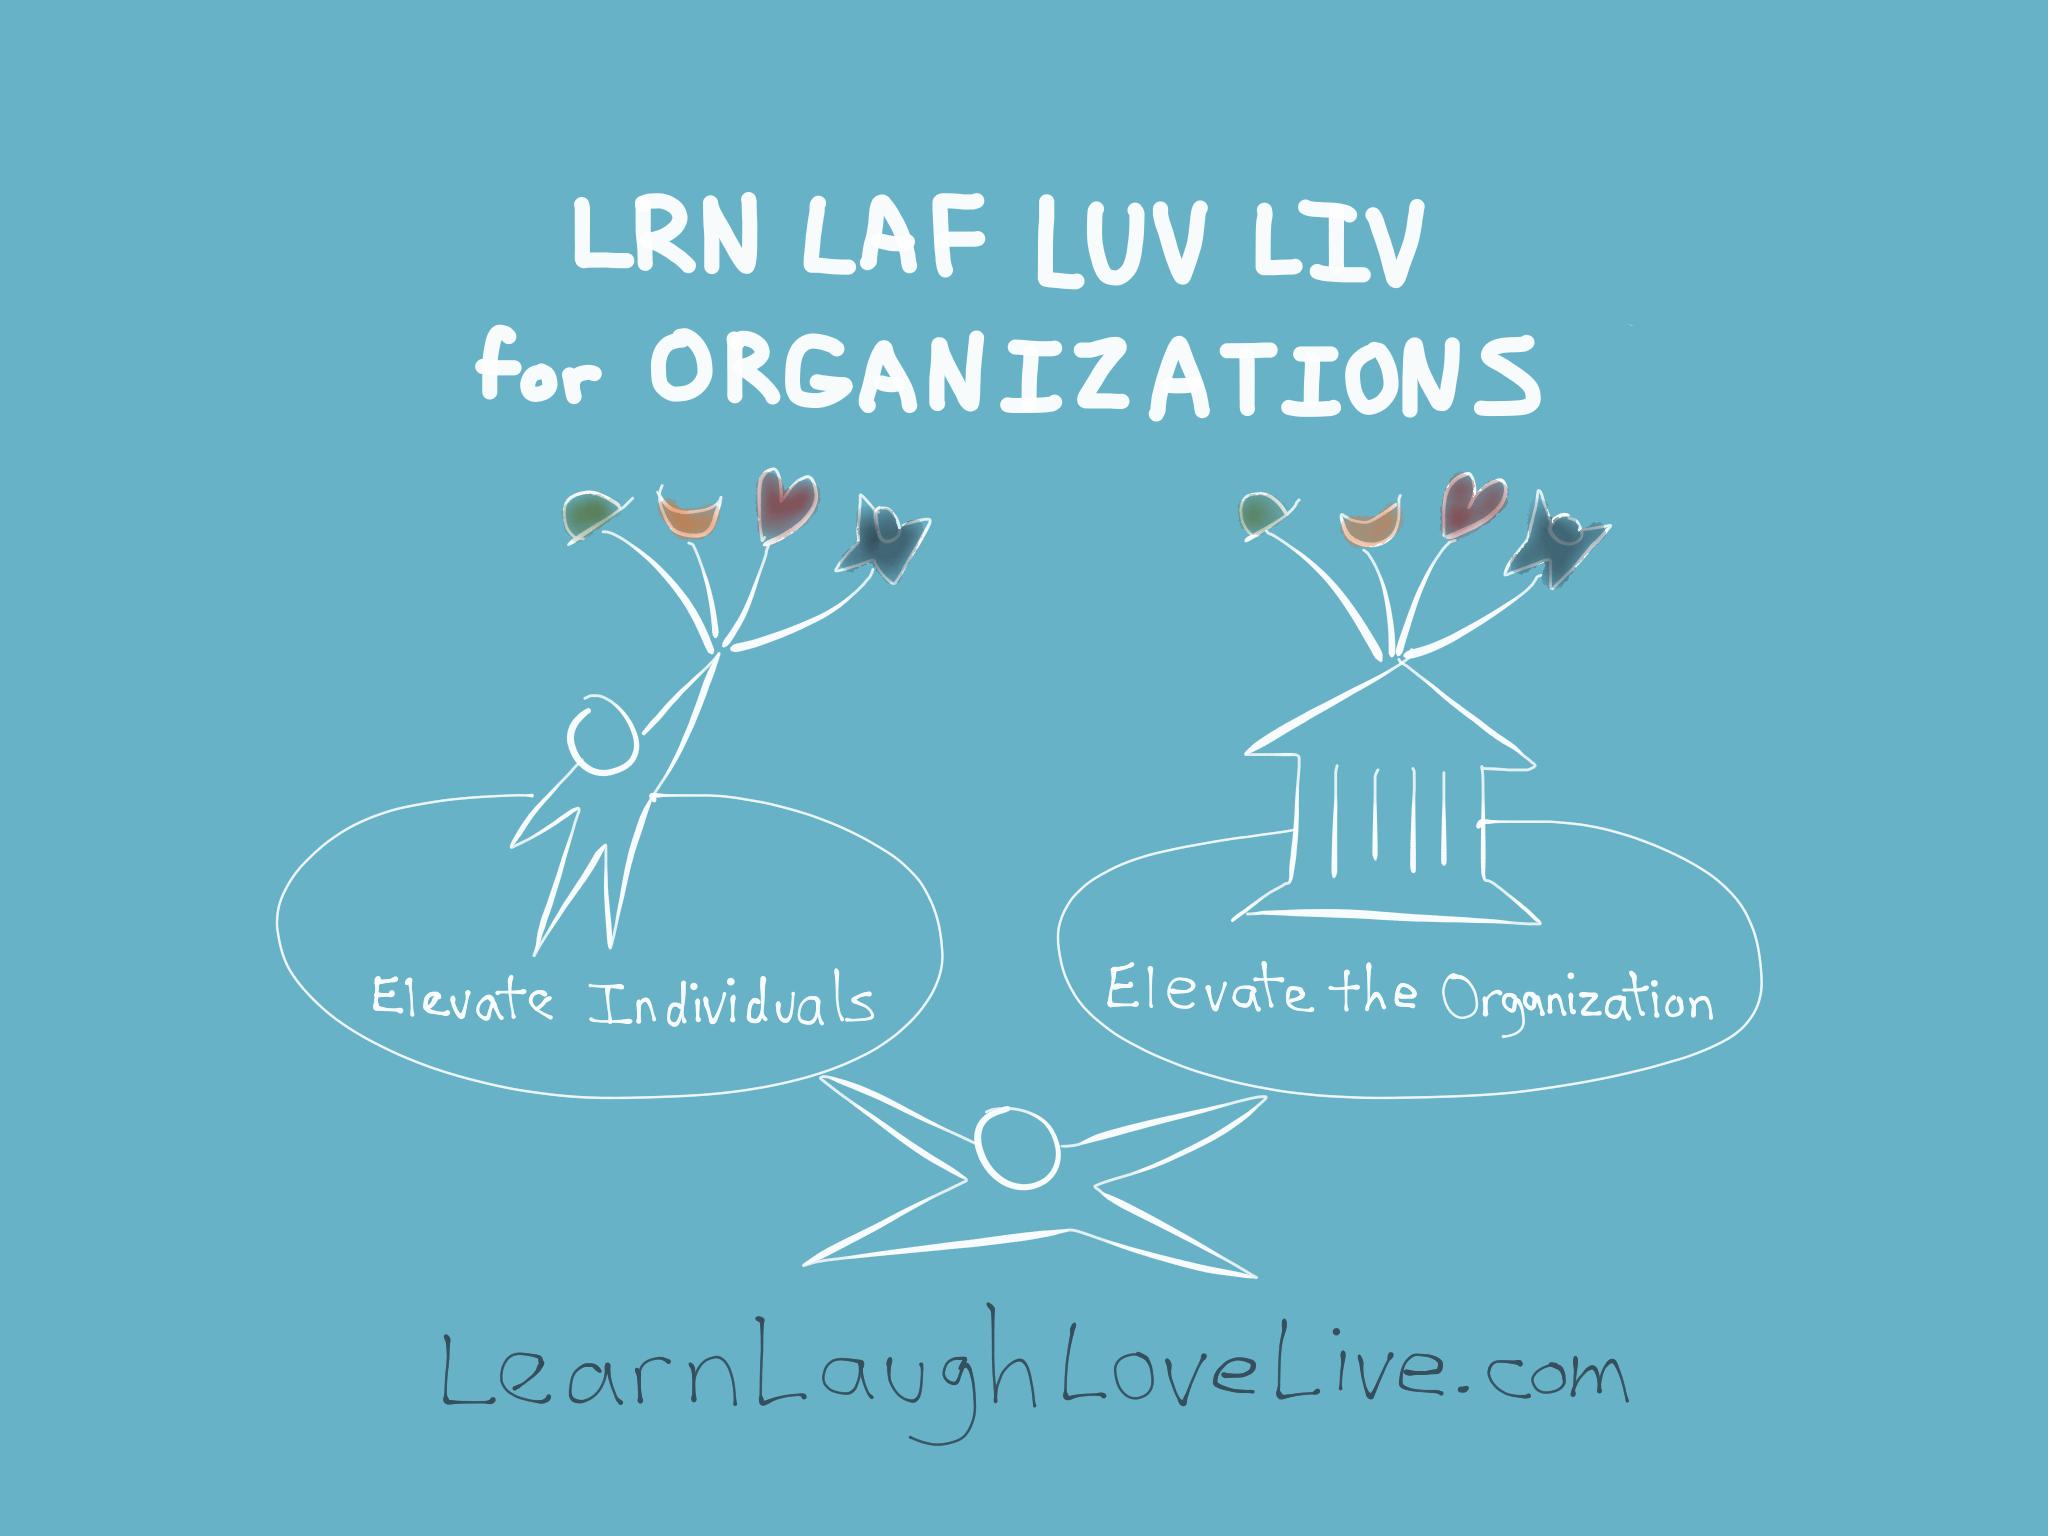 LRN LAF LUV LIV Organizations Learn Laugh Love Live Life LYF